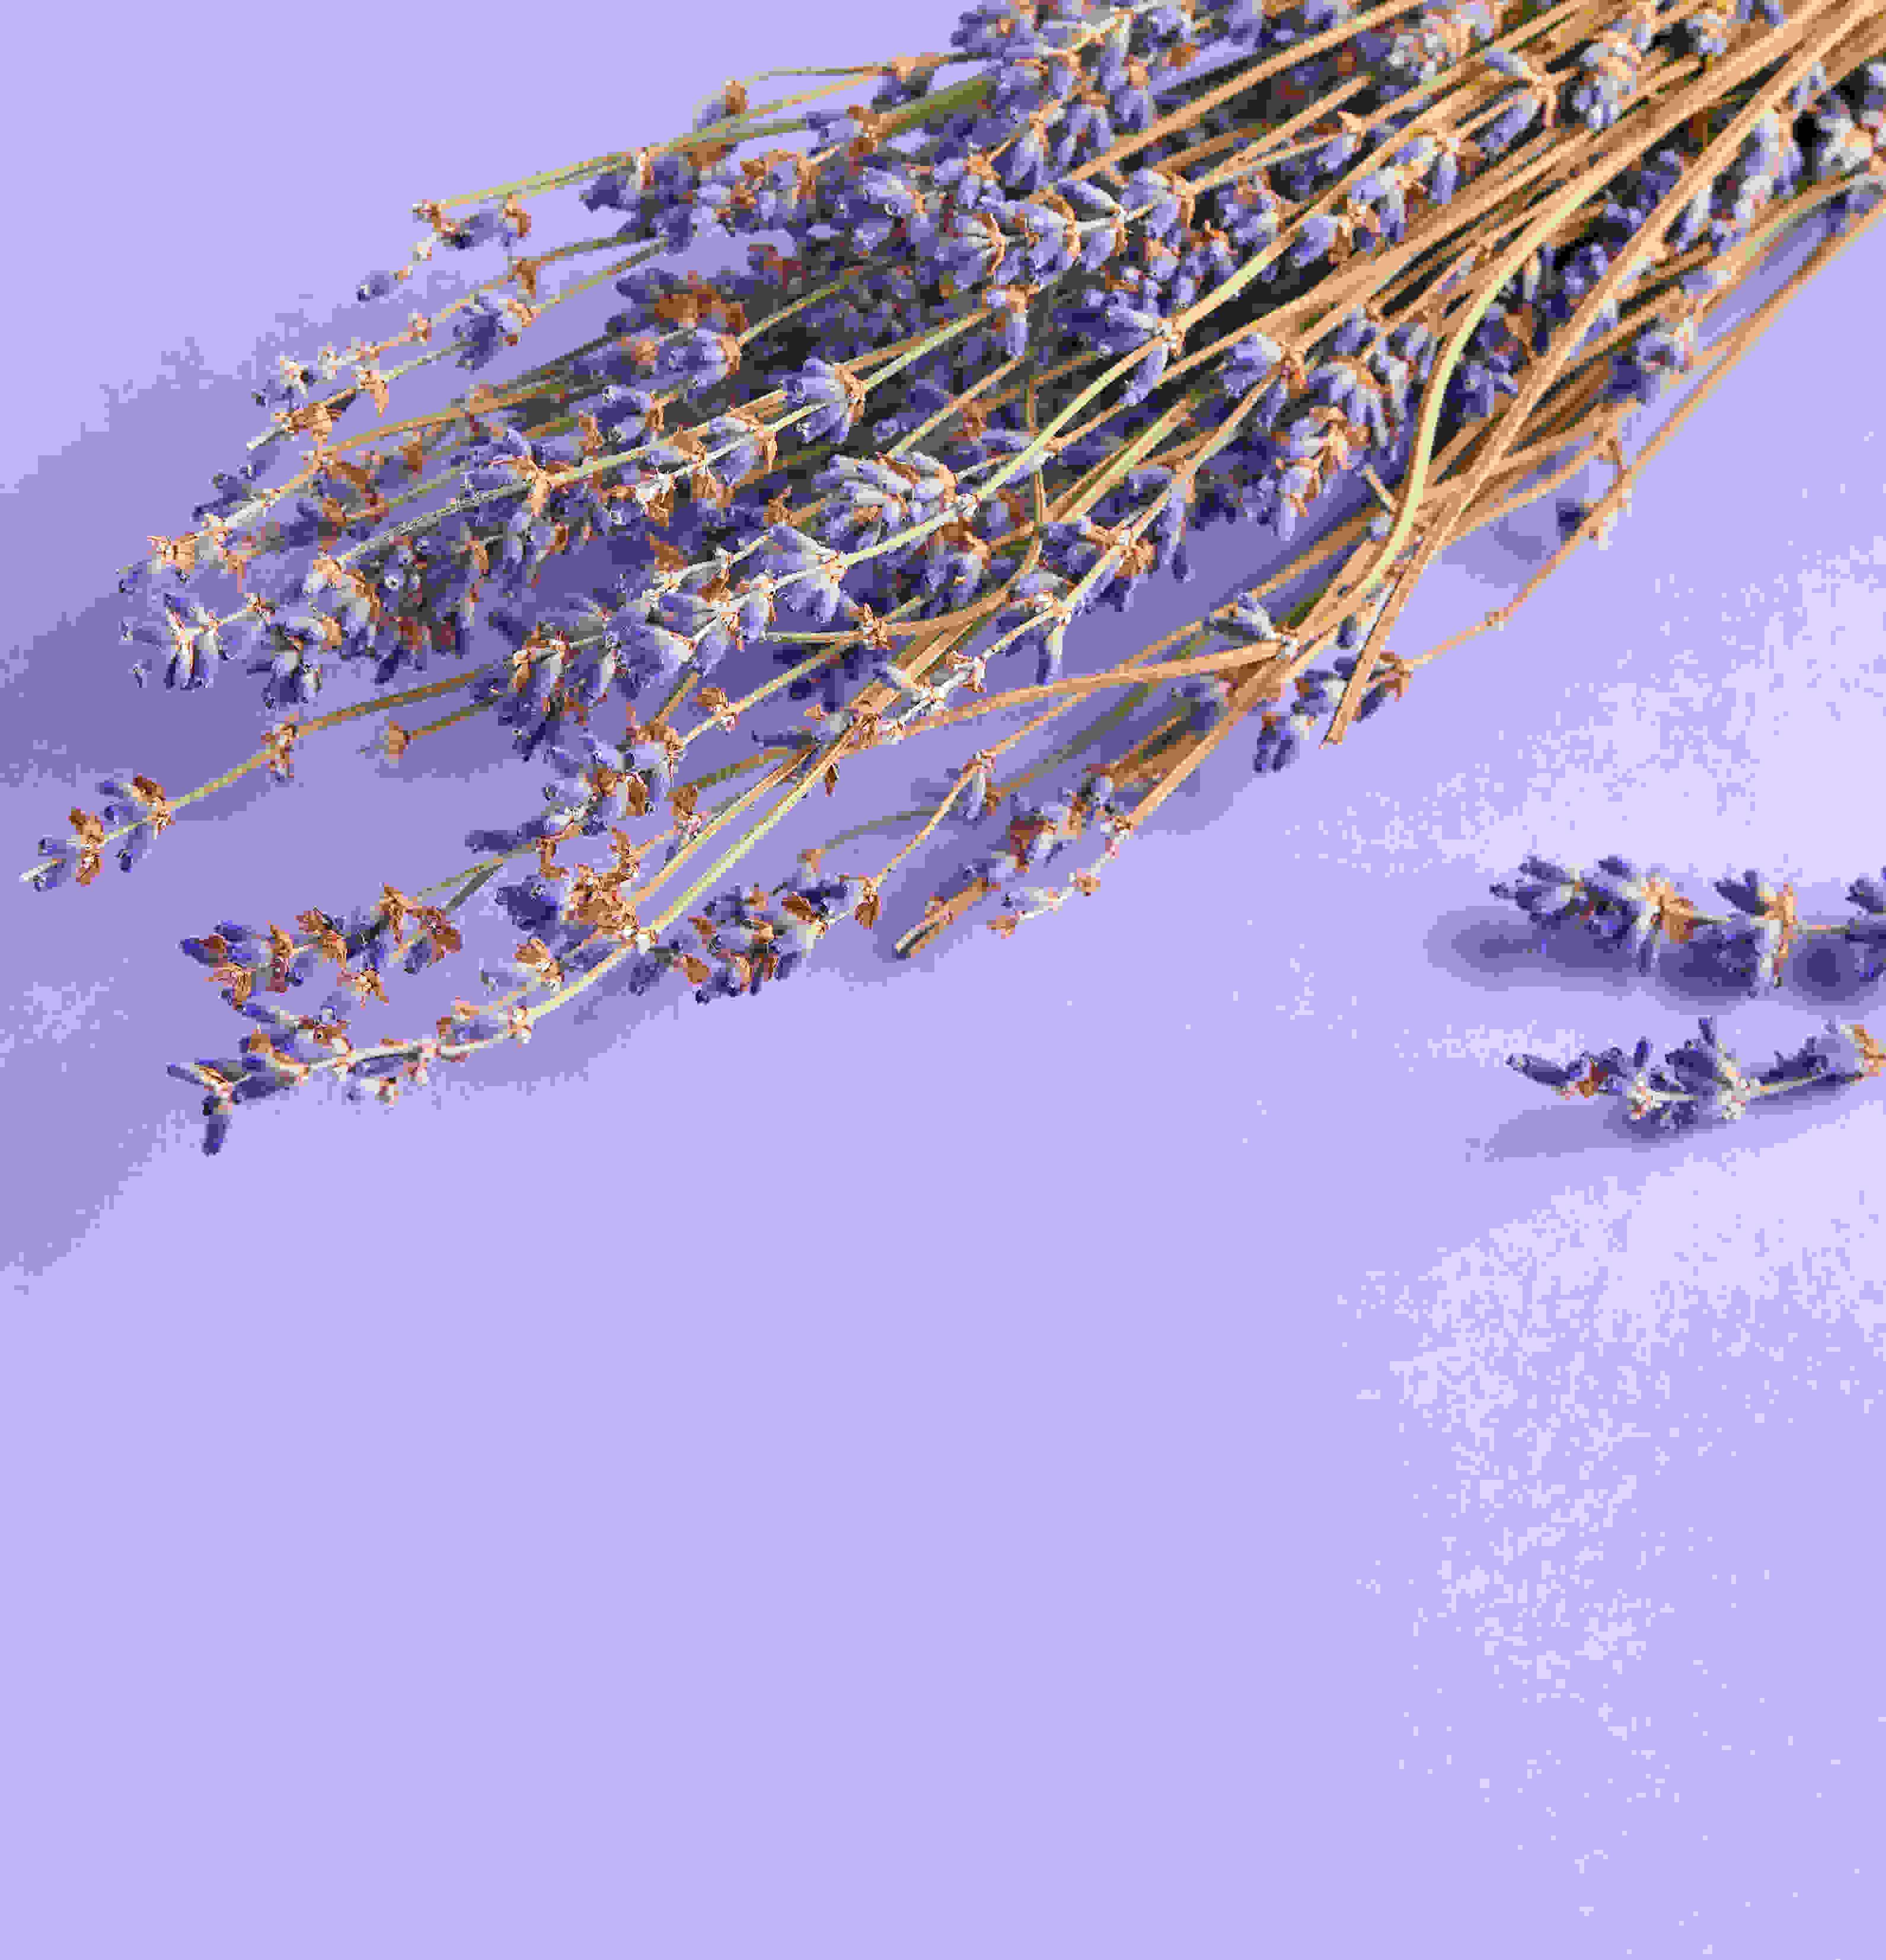 Image card - Soothing, balancing lavender